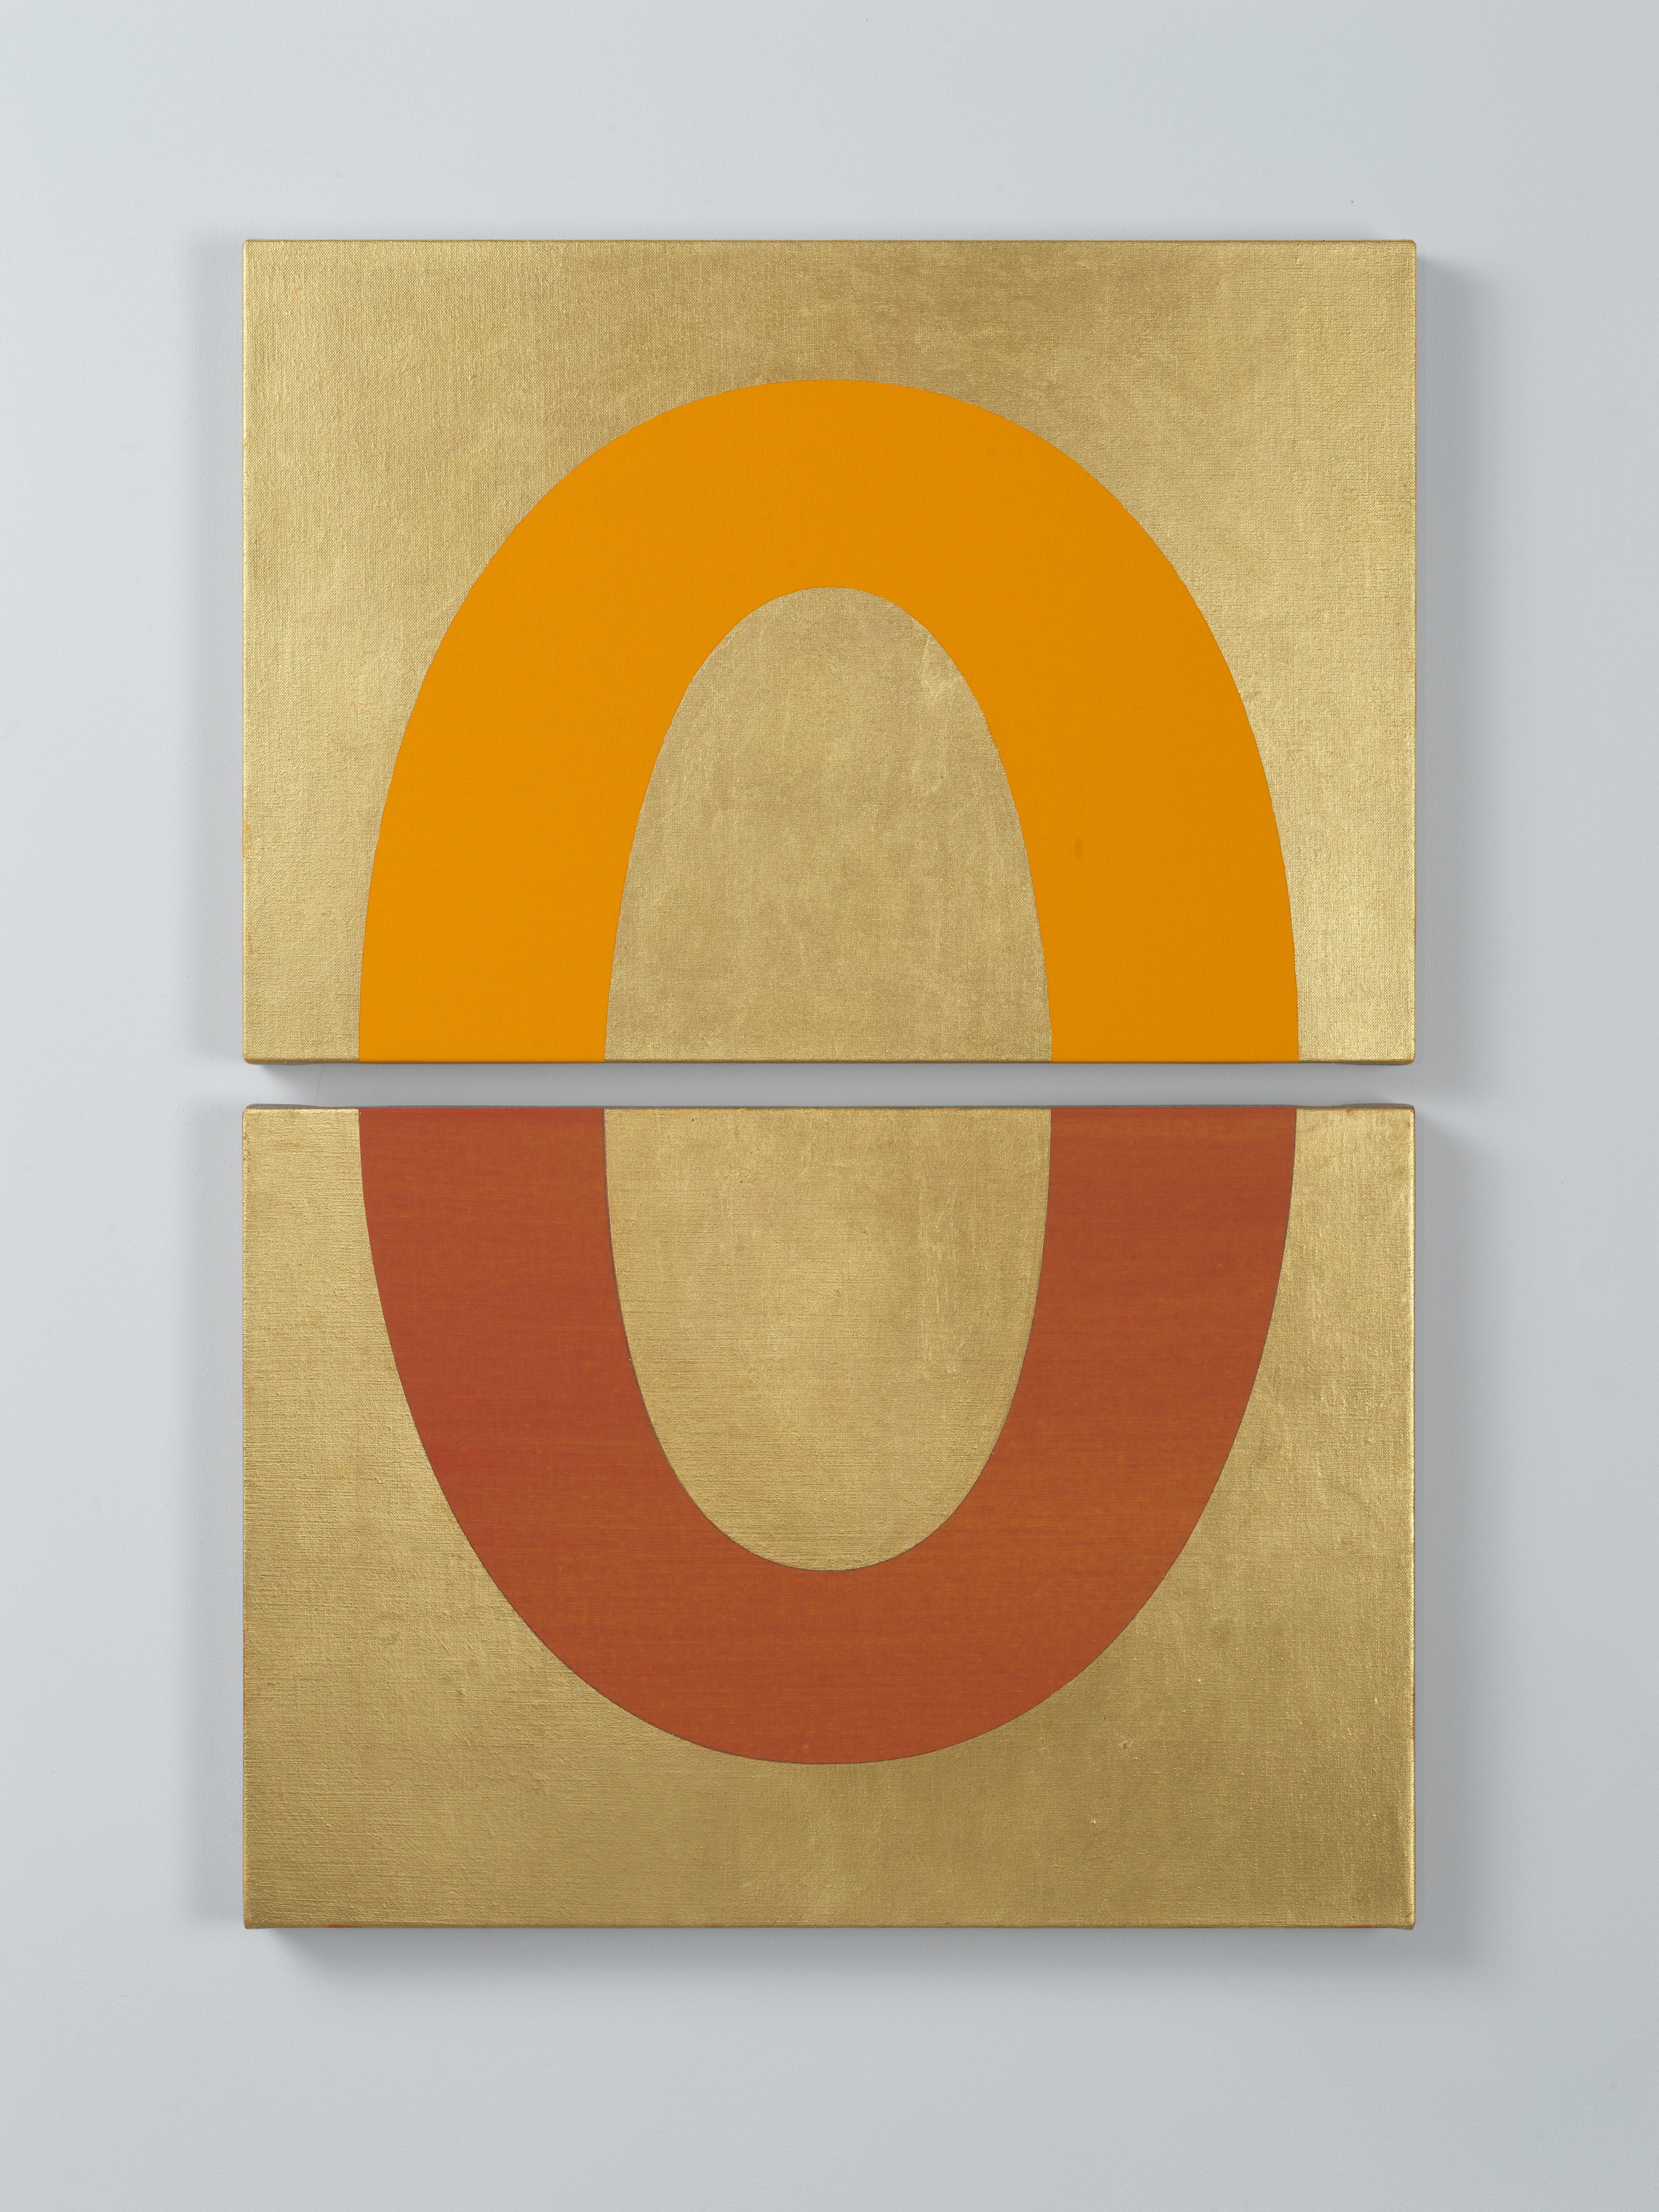 Darren Almond Rise 2019 Gold Acrylic And Graphite On Linen 72 X 50 X 3 Cm Artwork Linen Art